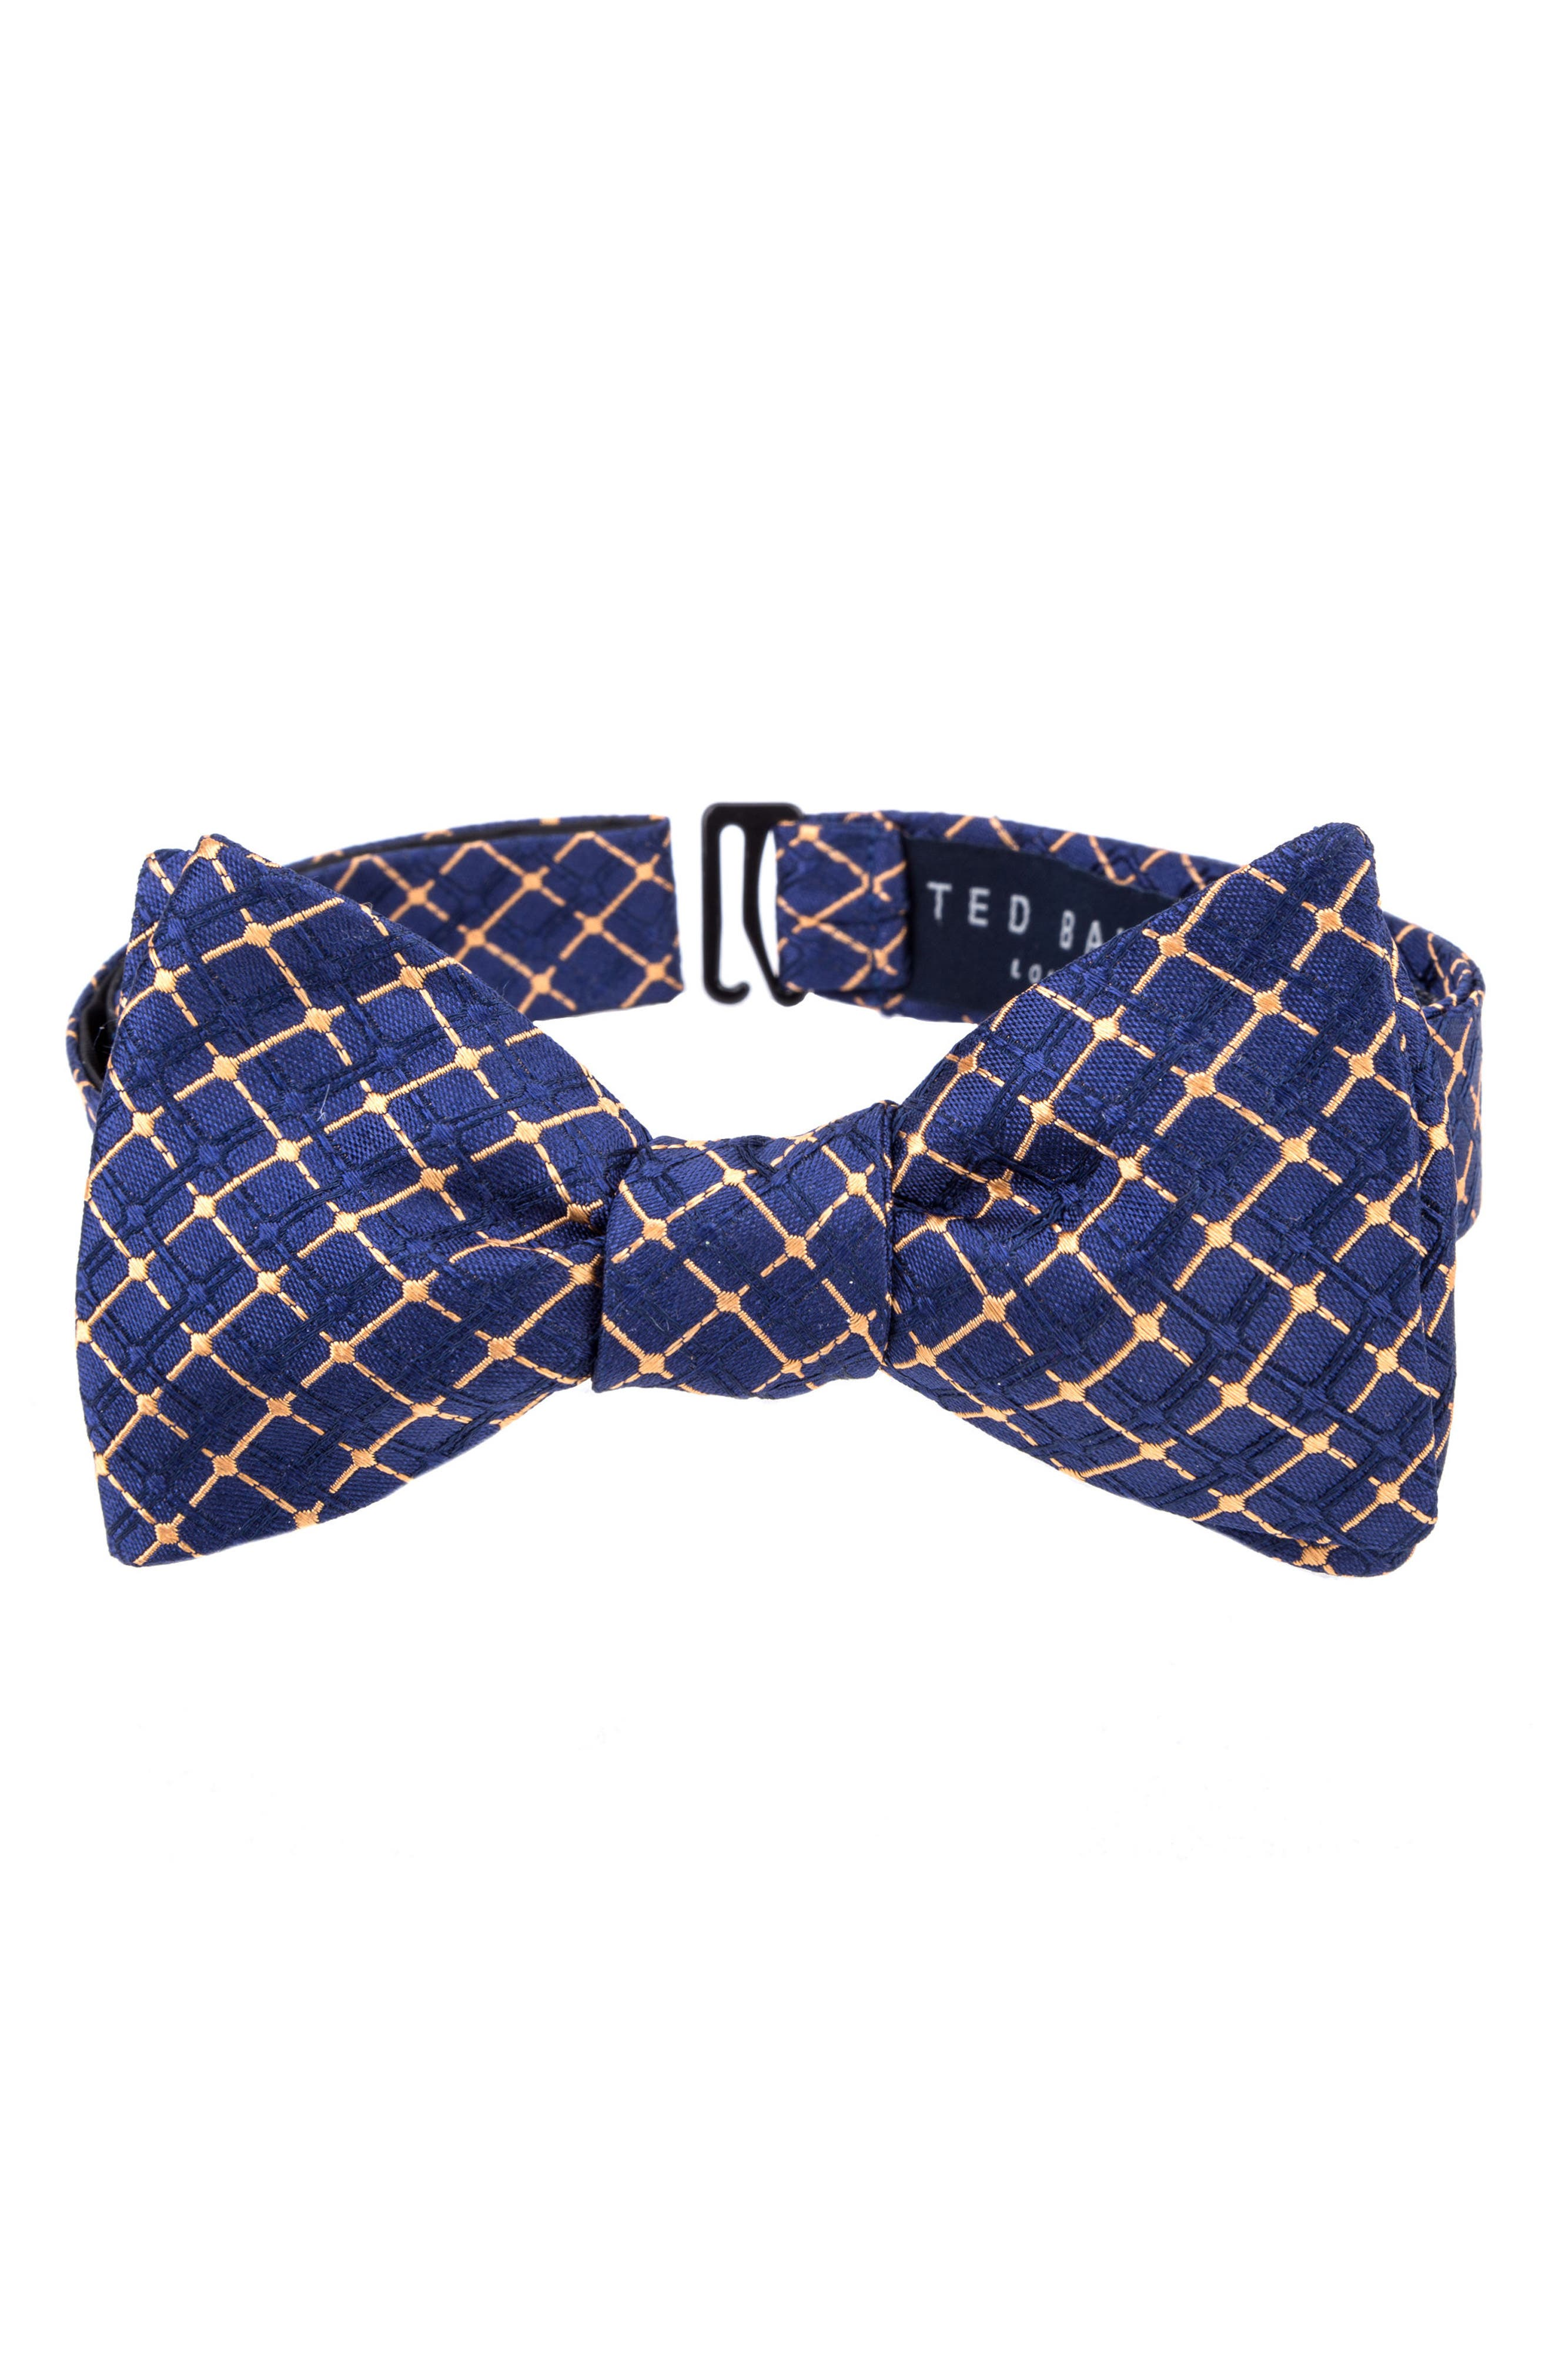 Superb Check Silk Bow Tie,                             Main thumbnail 6, color,